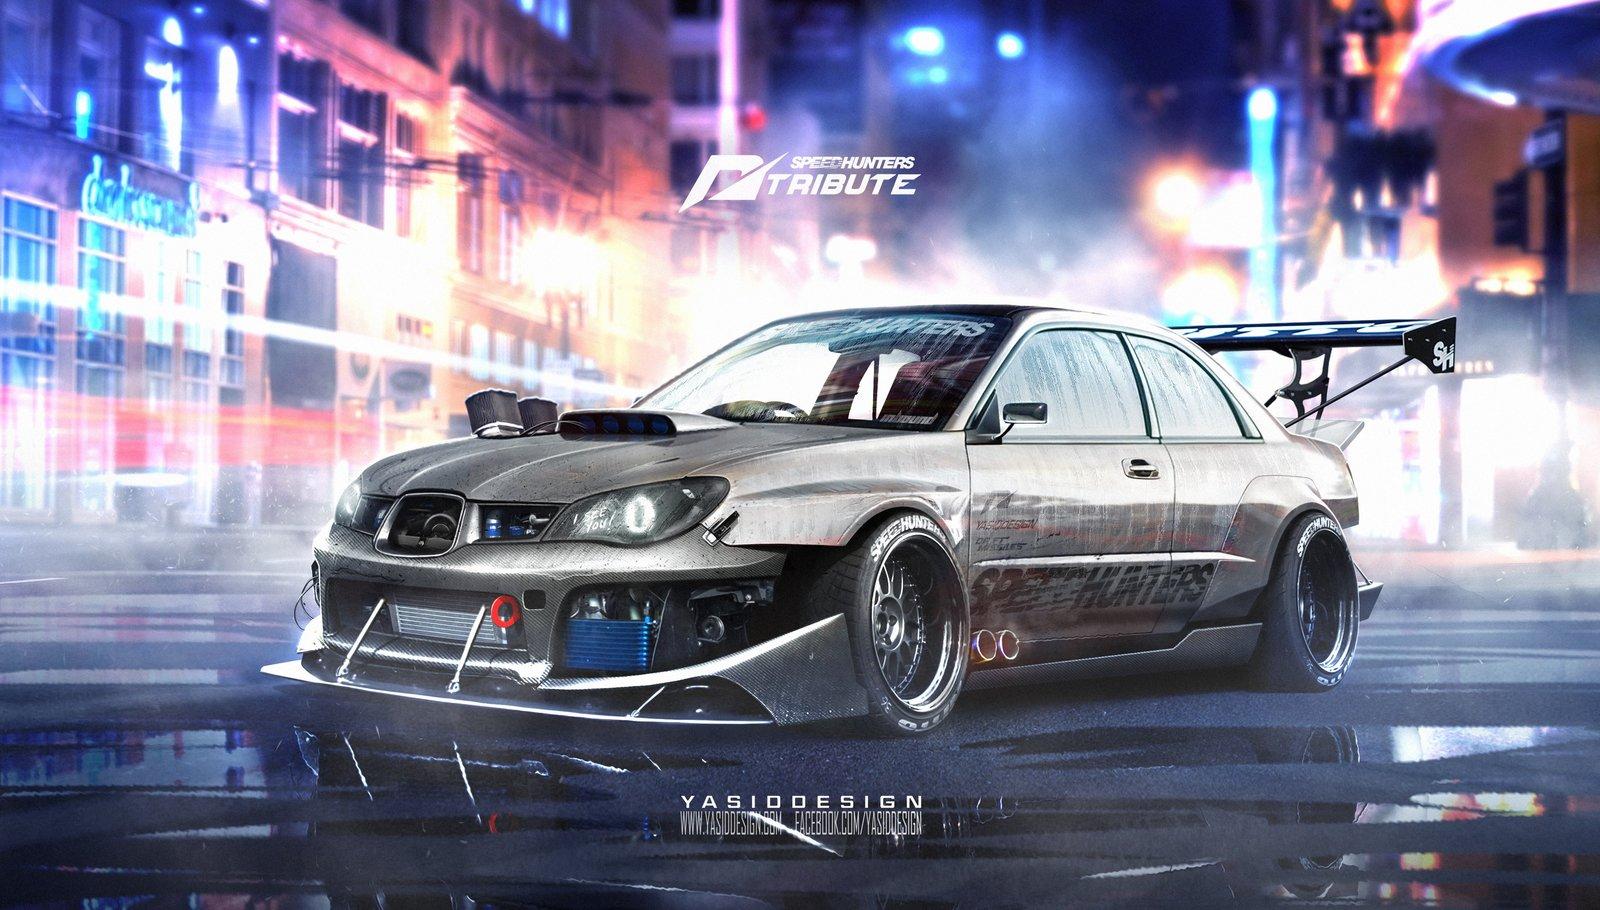 Speedhunters Subaru Impreza STI _ Need for speed Tribute